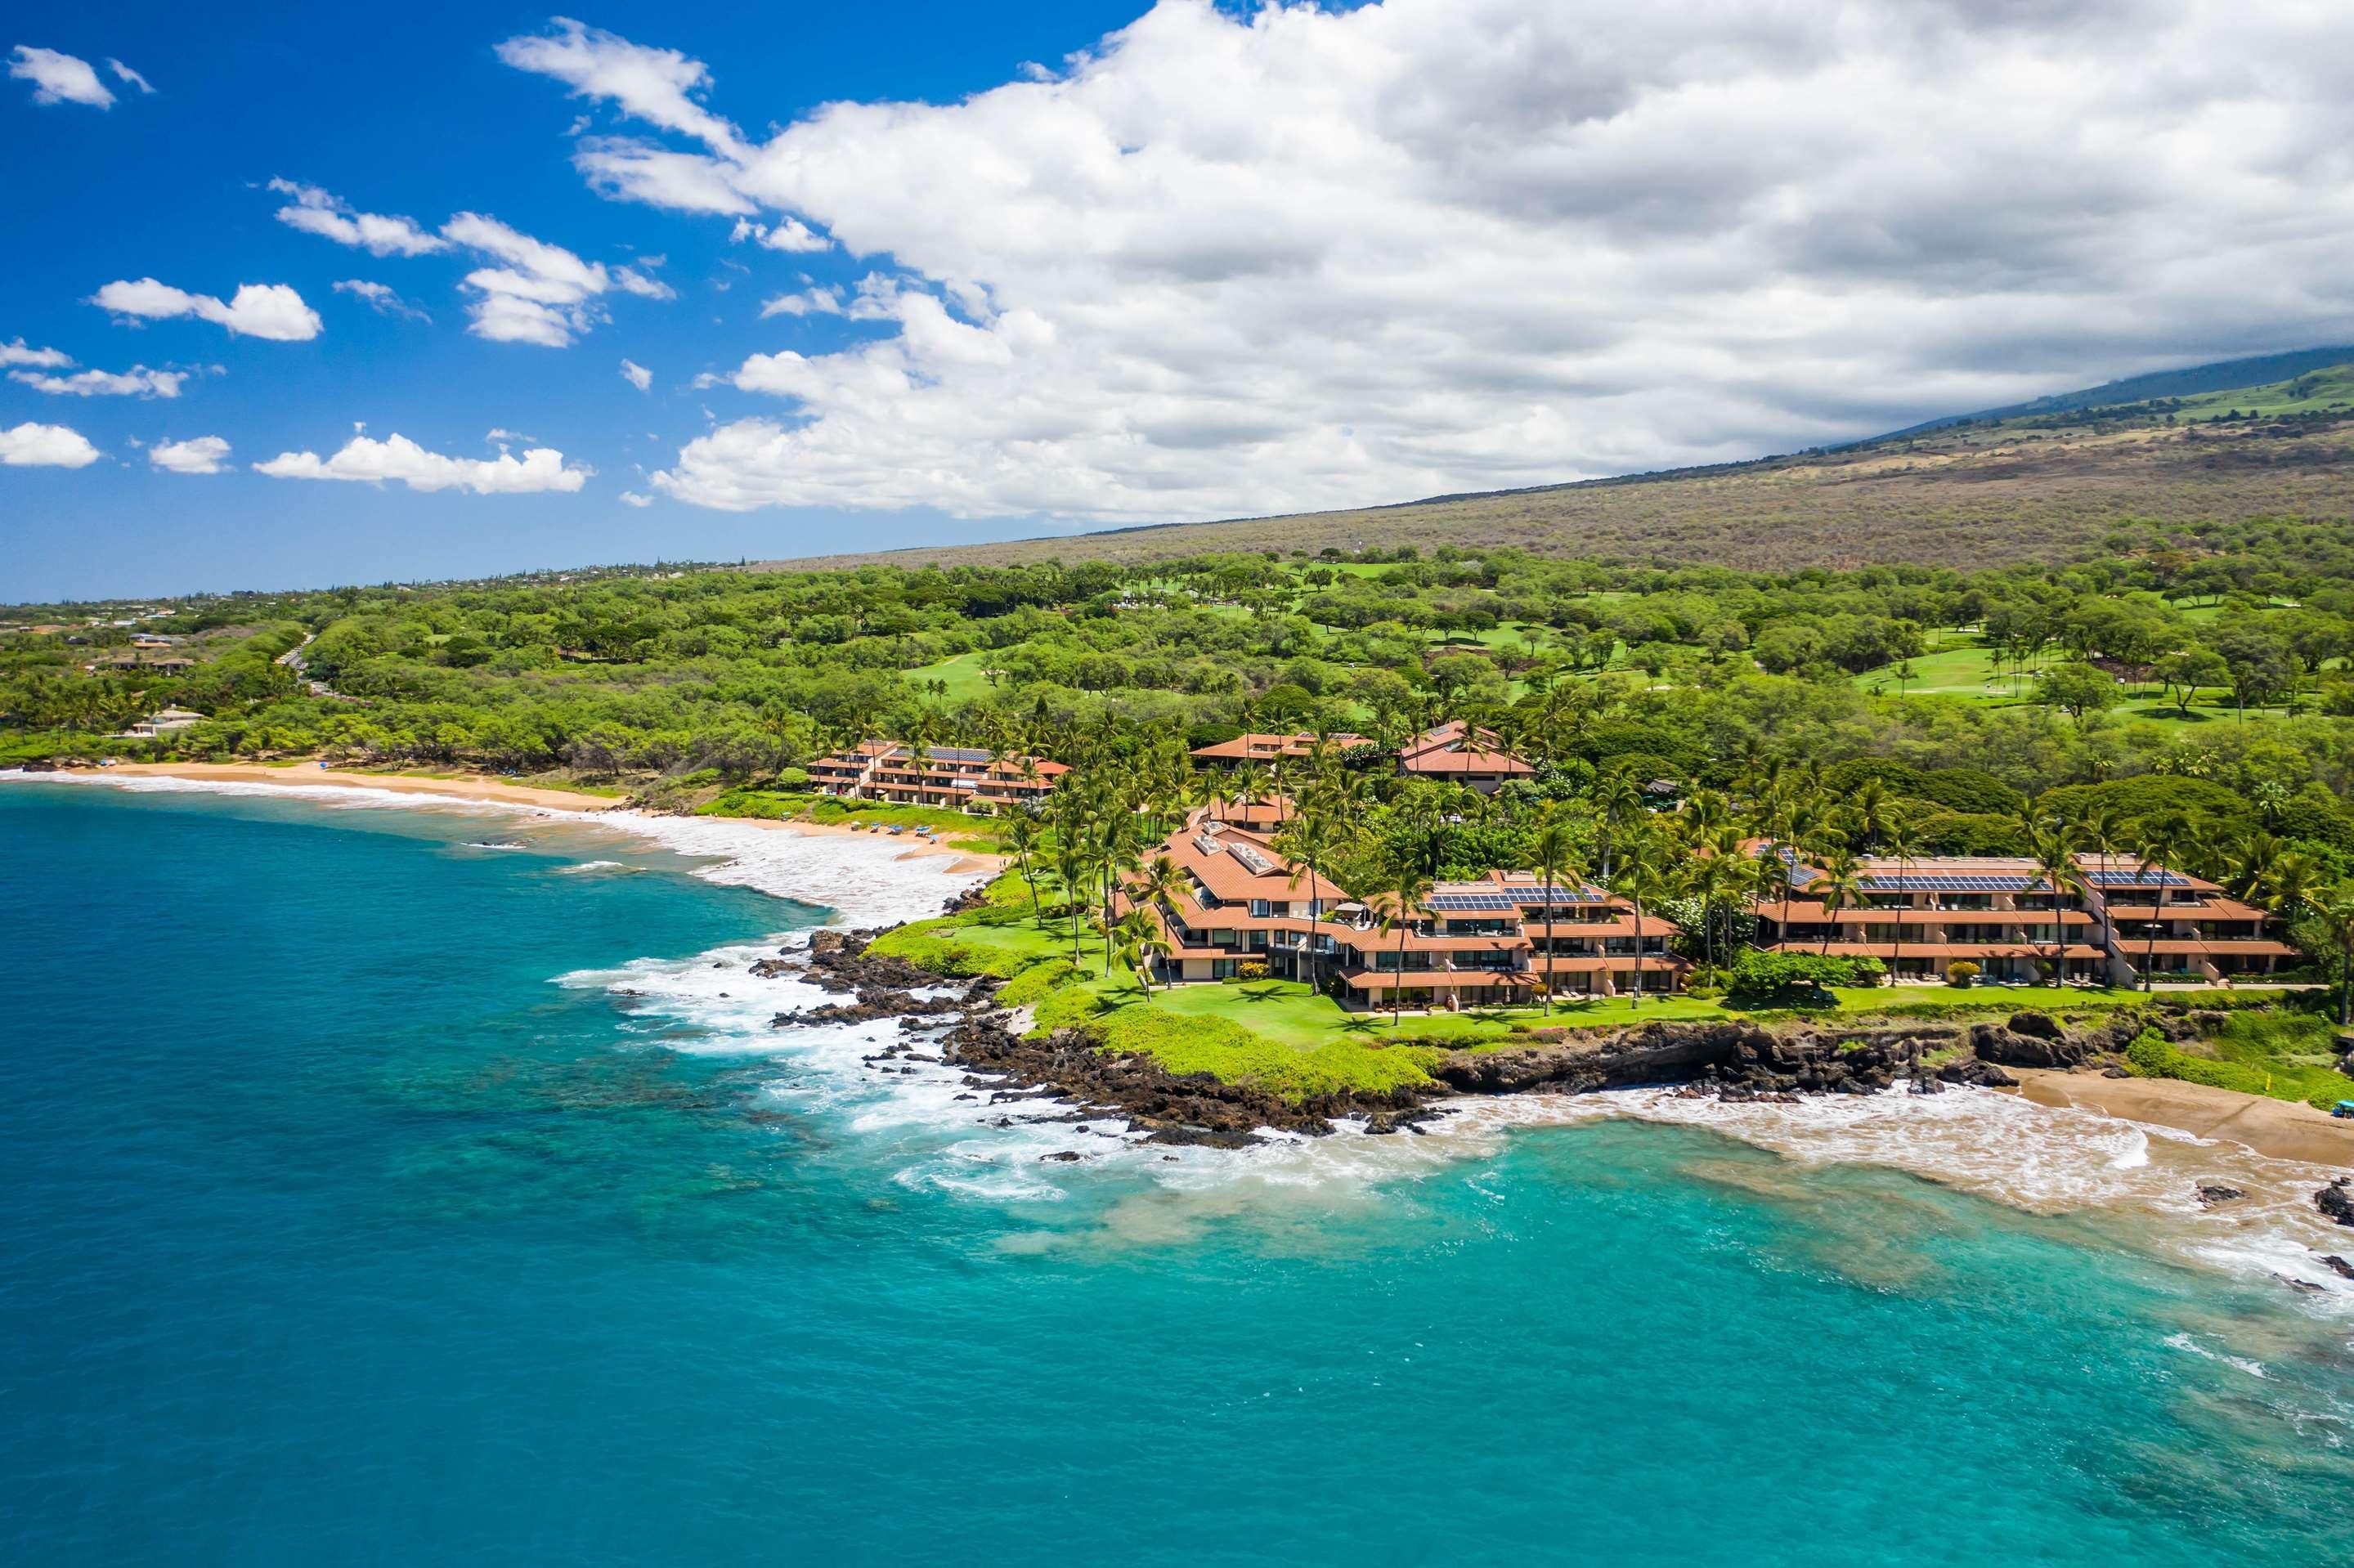 Maui Hotels 9 045 Cheap Maui Hotel Deals